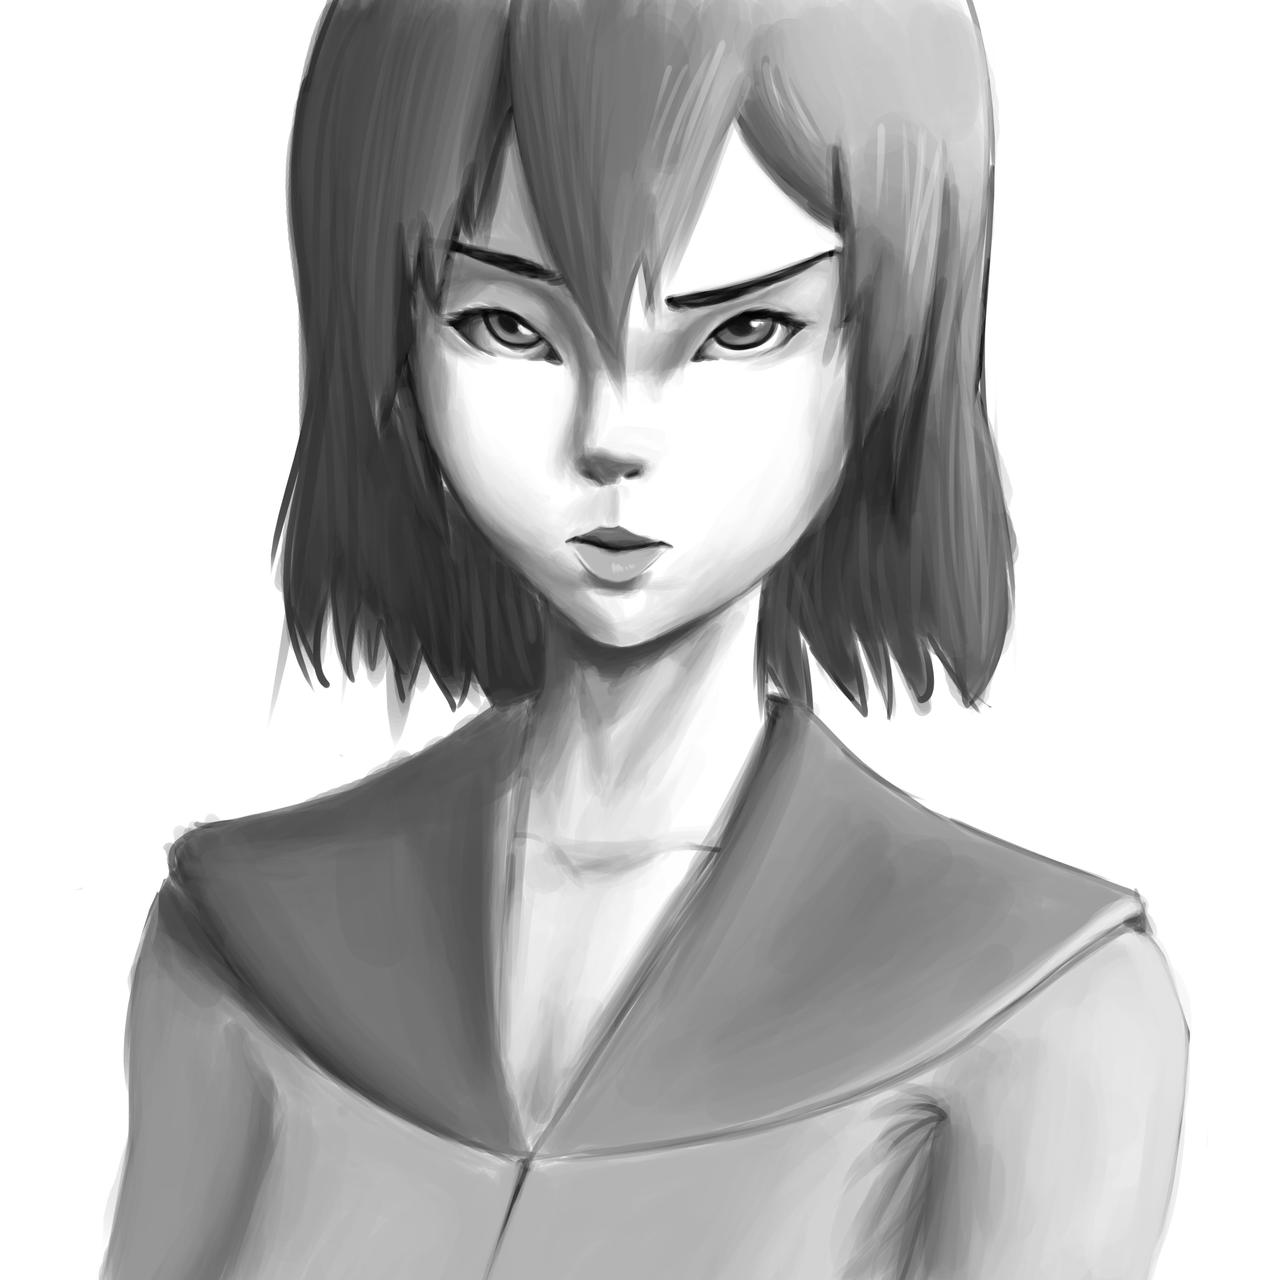 Mitsuki by MrIkki